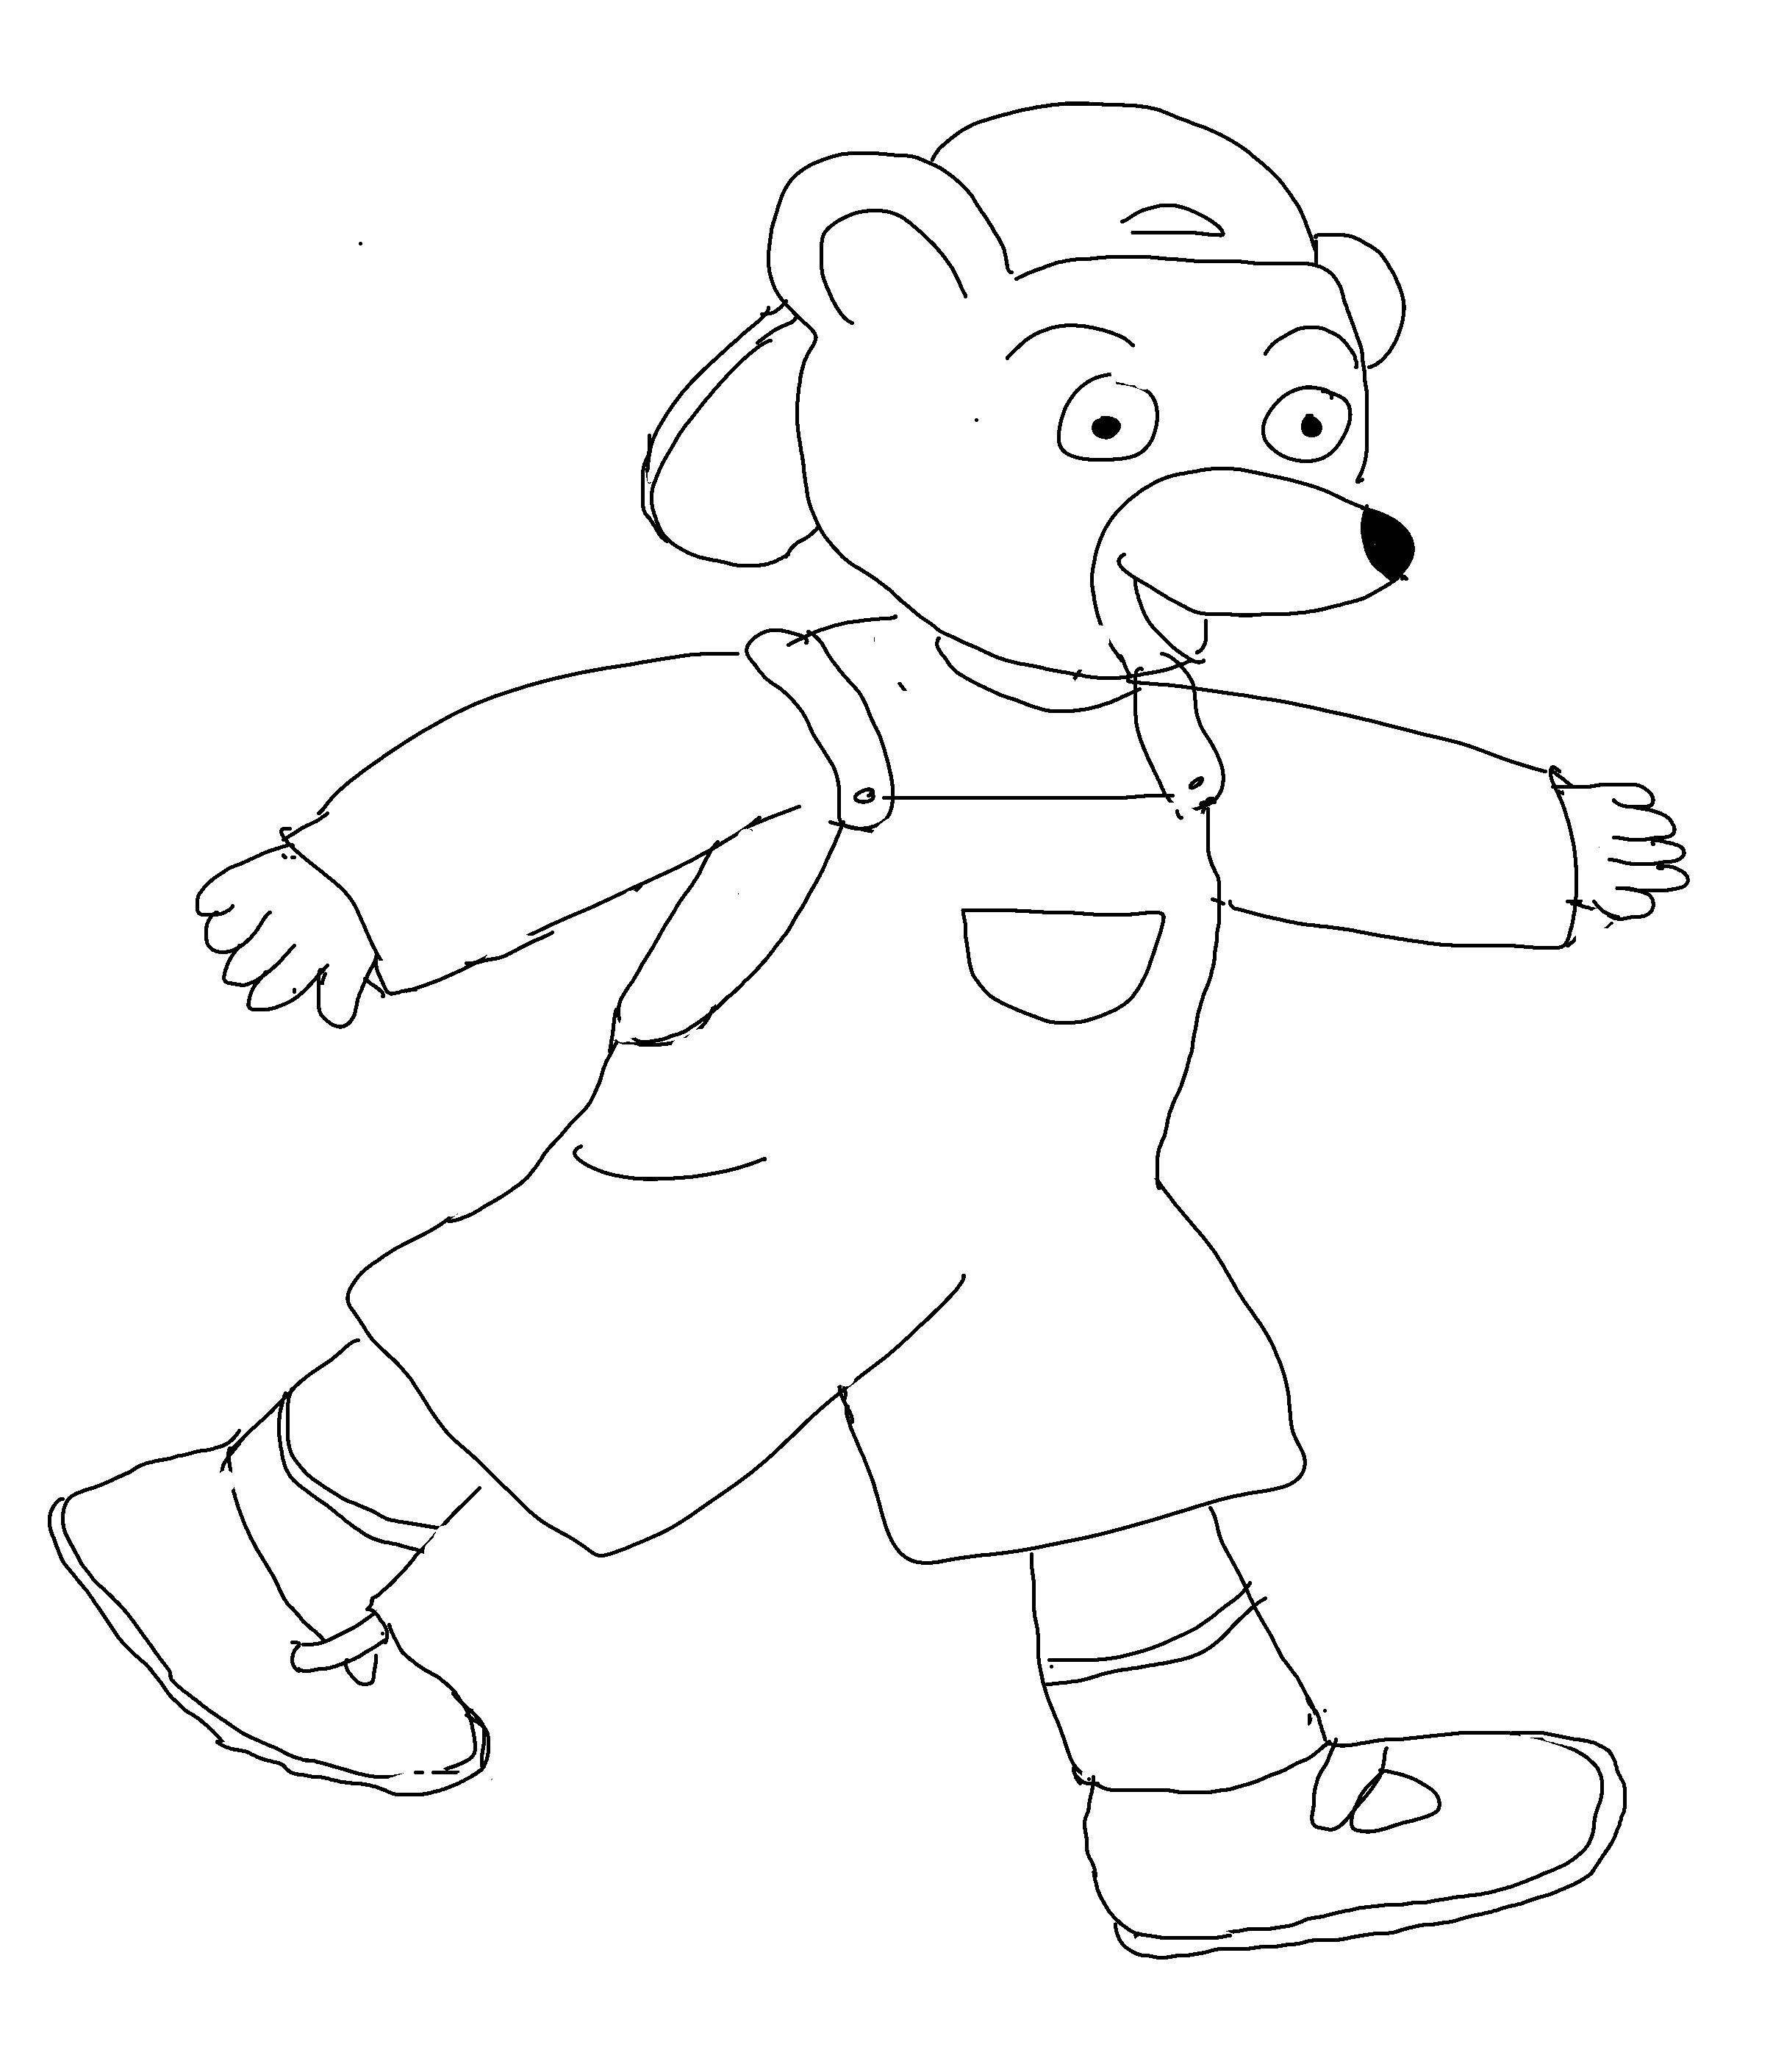 tlcharger petit ours brun - Petit Ours Brun Telecharger